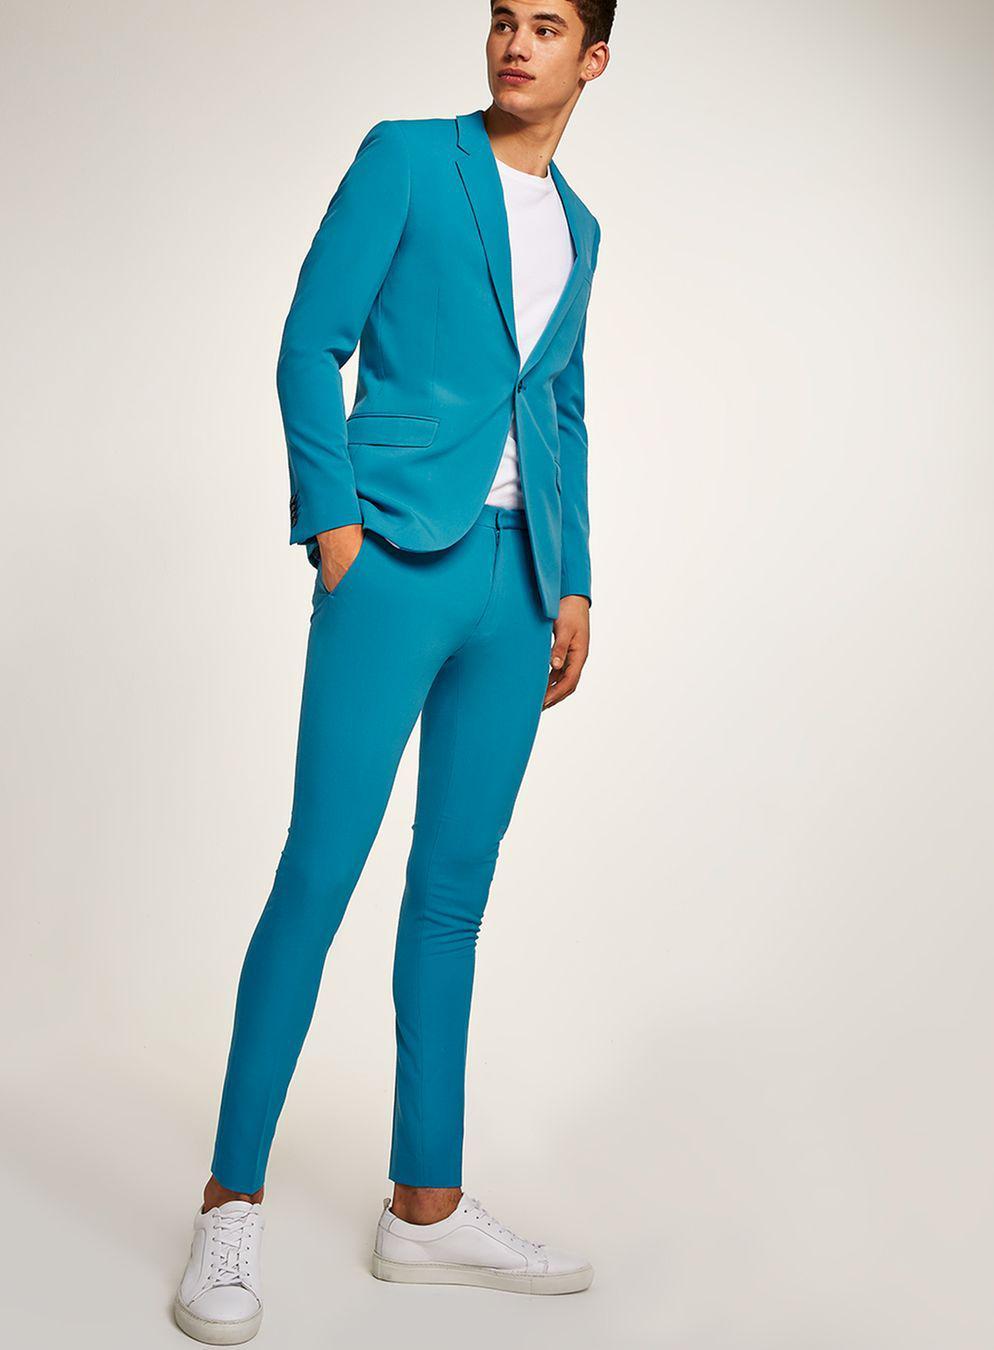 Lyst - Topman Bright Blue Spray On Suit Trouser in Blue for Men